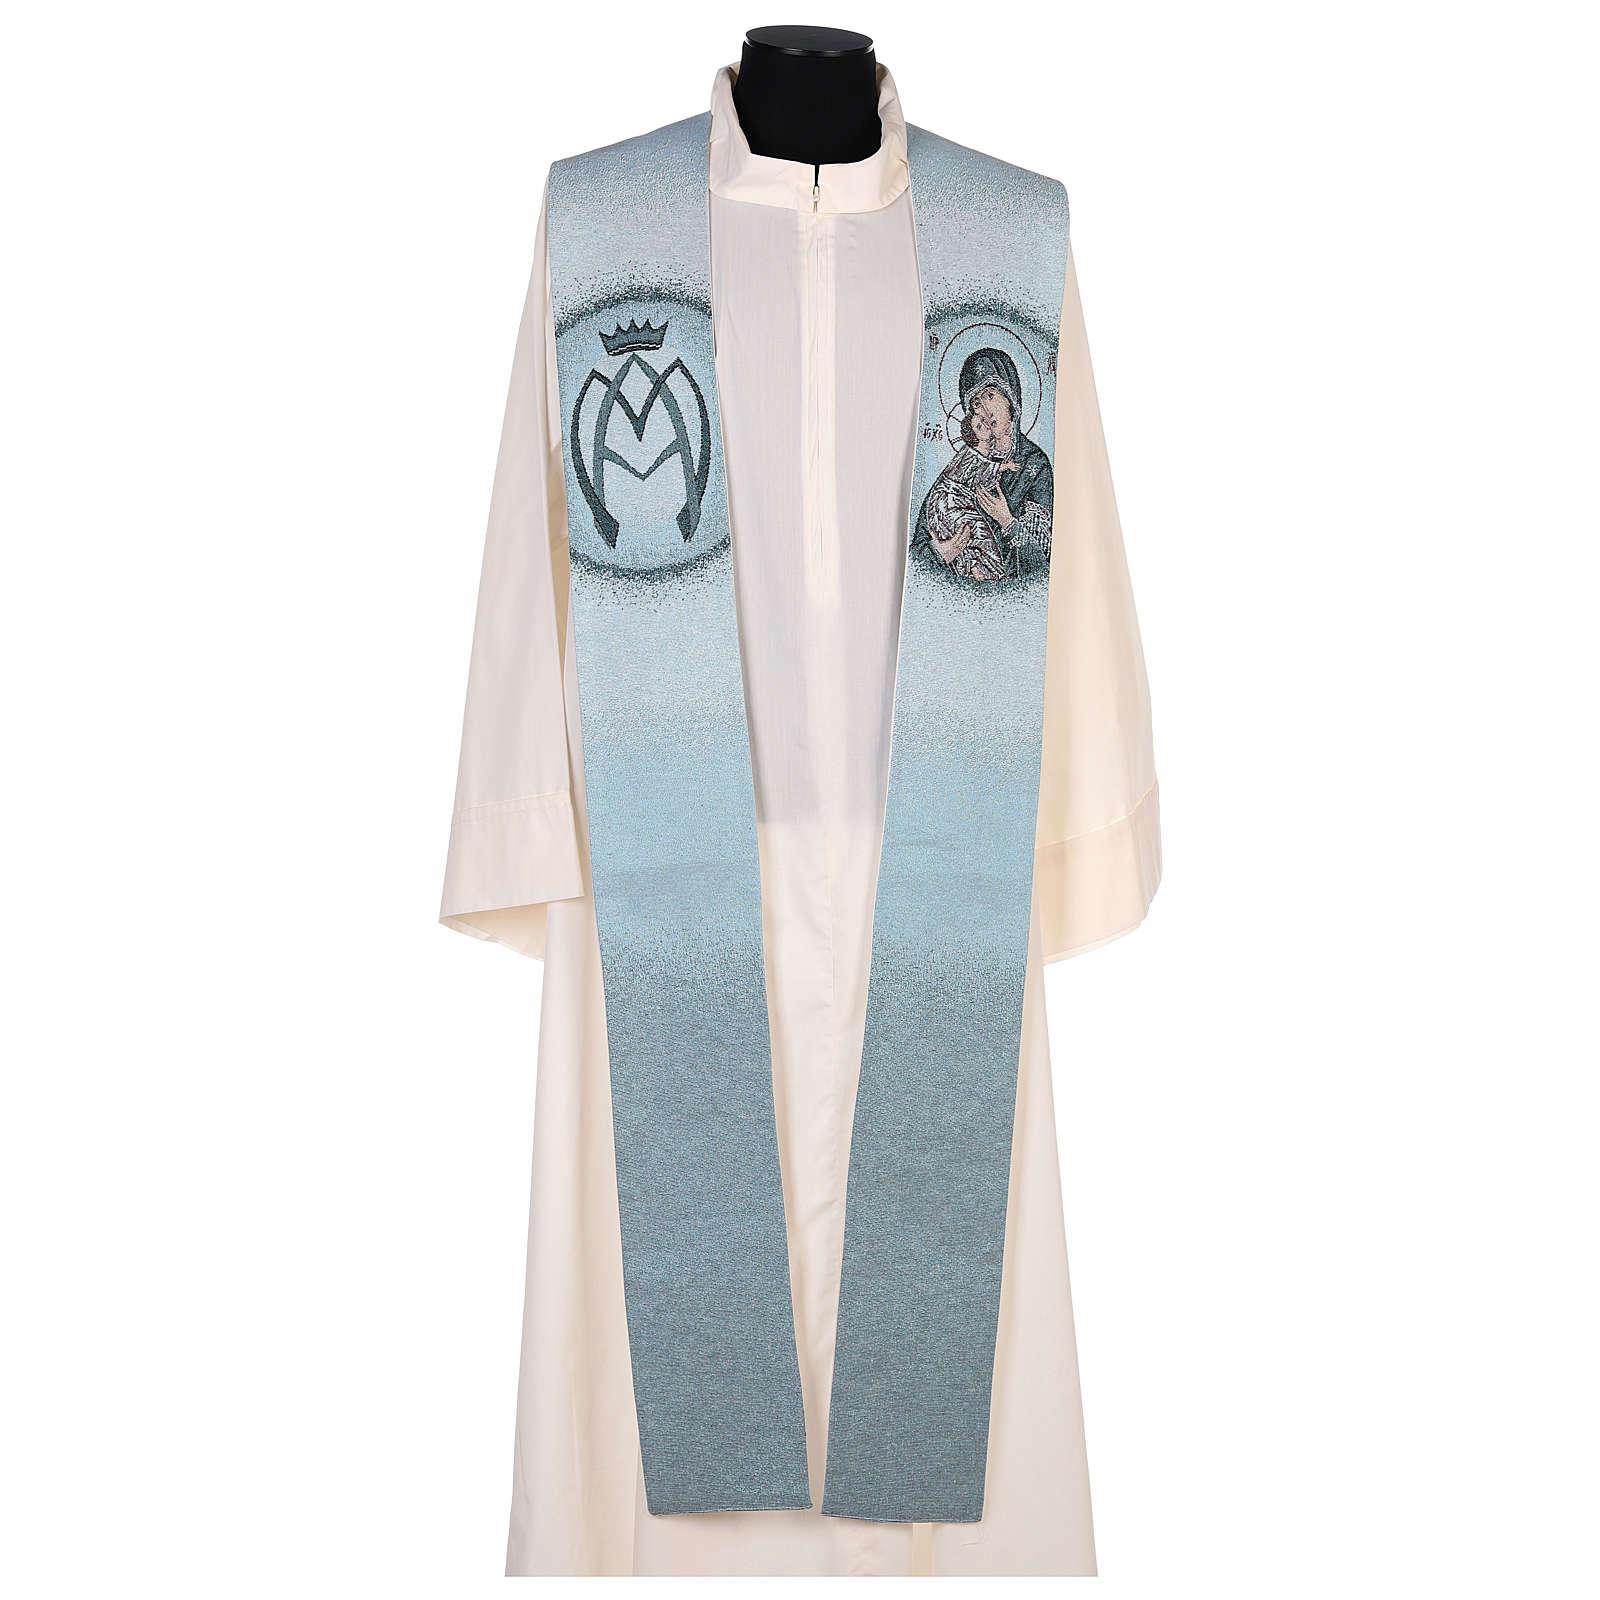 Étole fond bleu Vierge de Tendresse 4